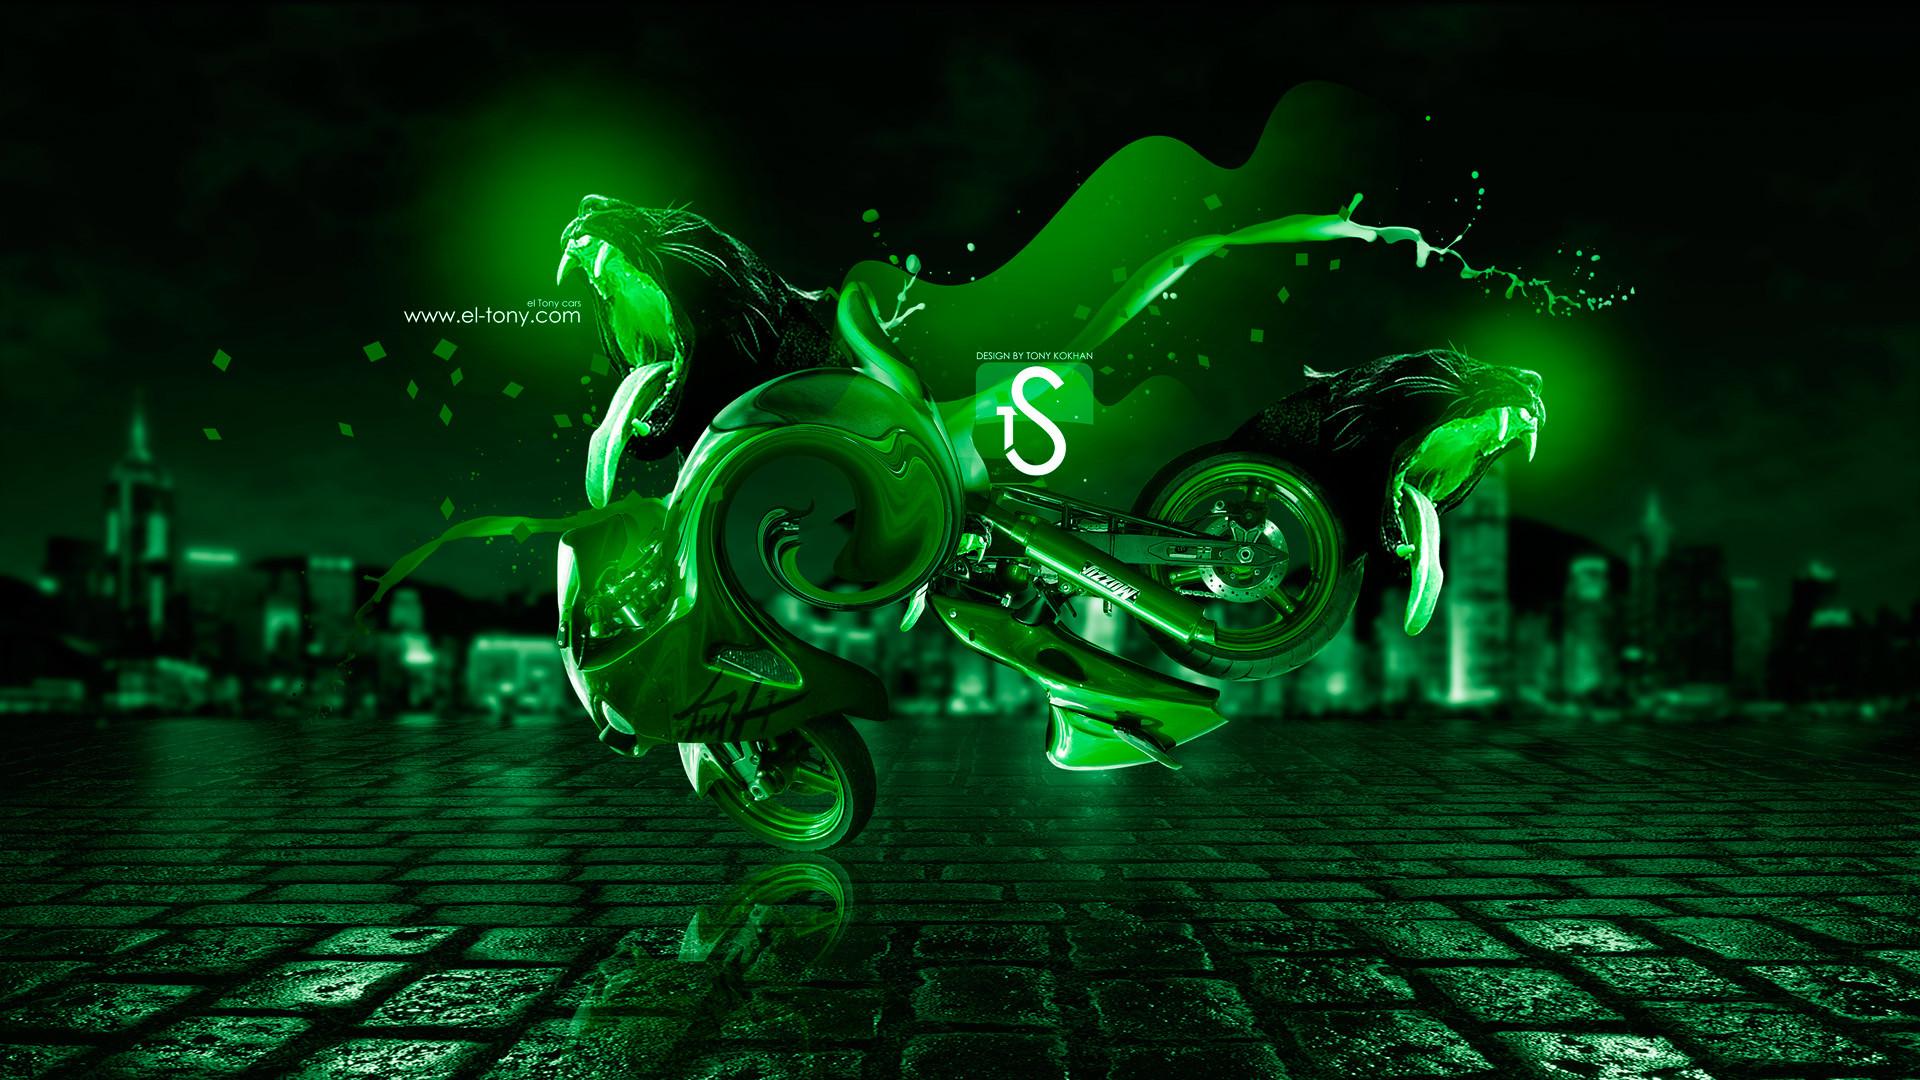 Neon Green Wallpaper Design Suzuki hayabusa fantasy panter